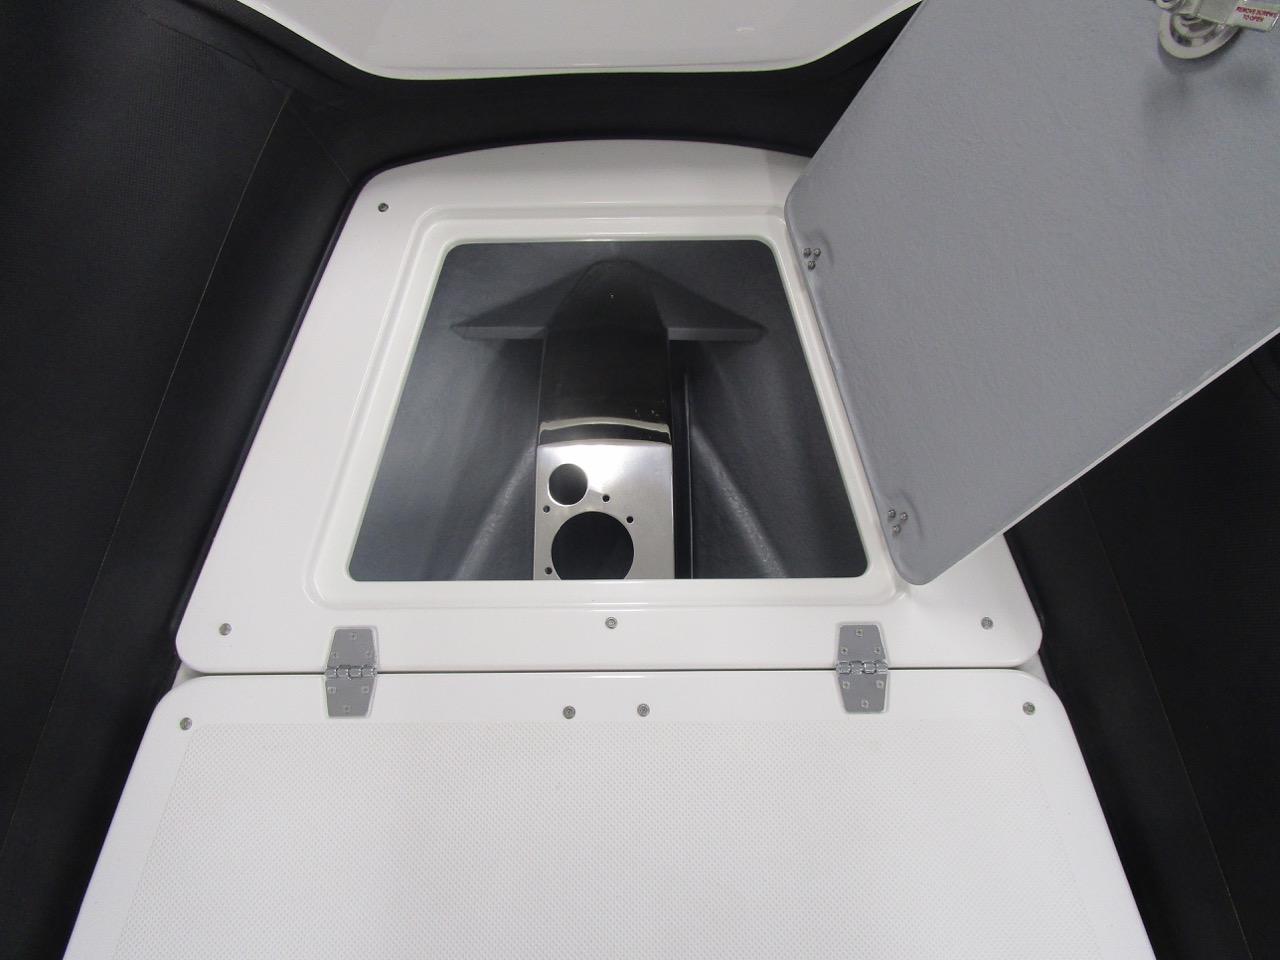 GRAND G850 RIB anchor locker open